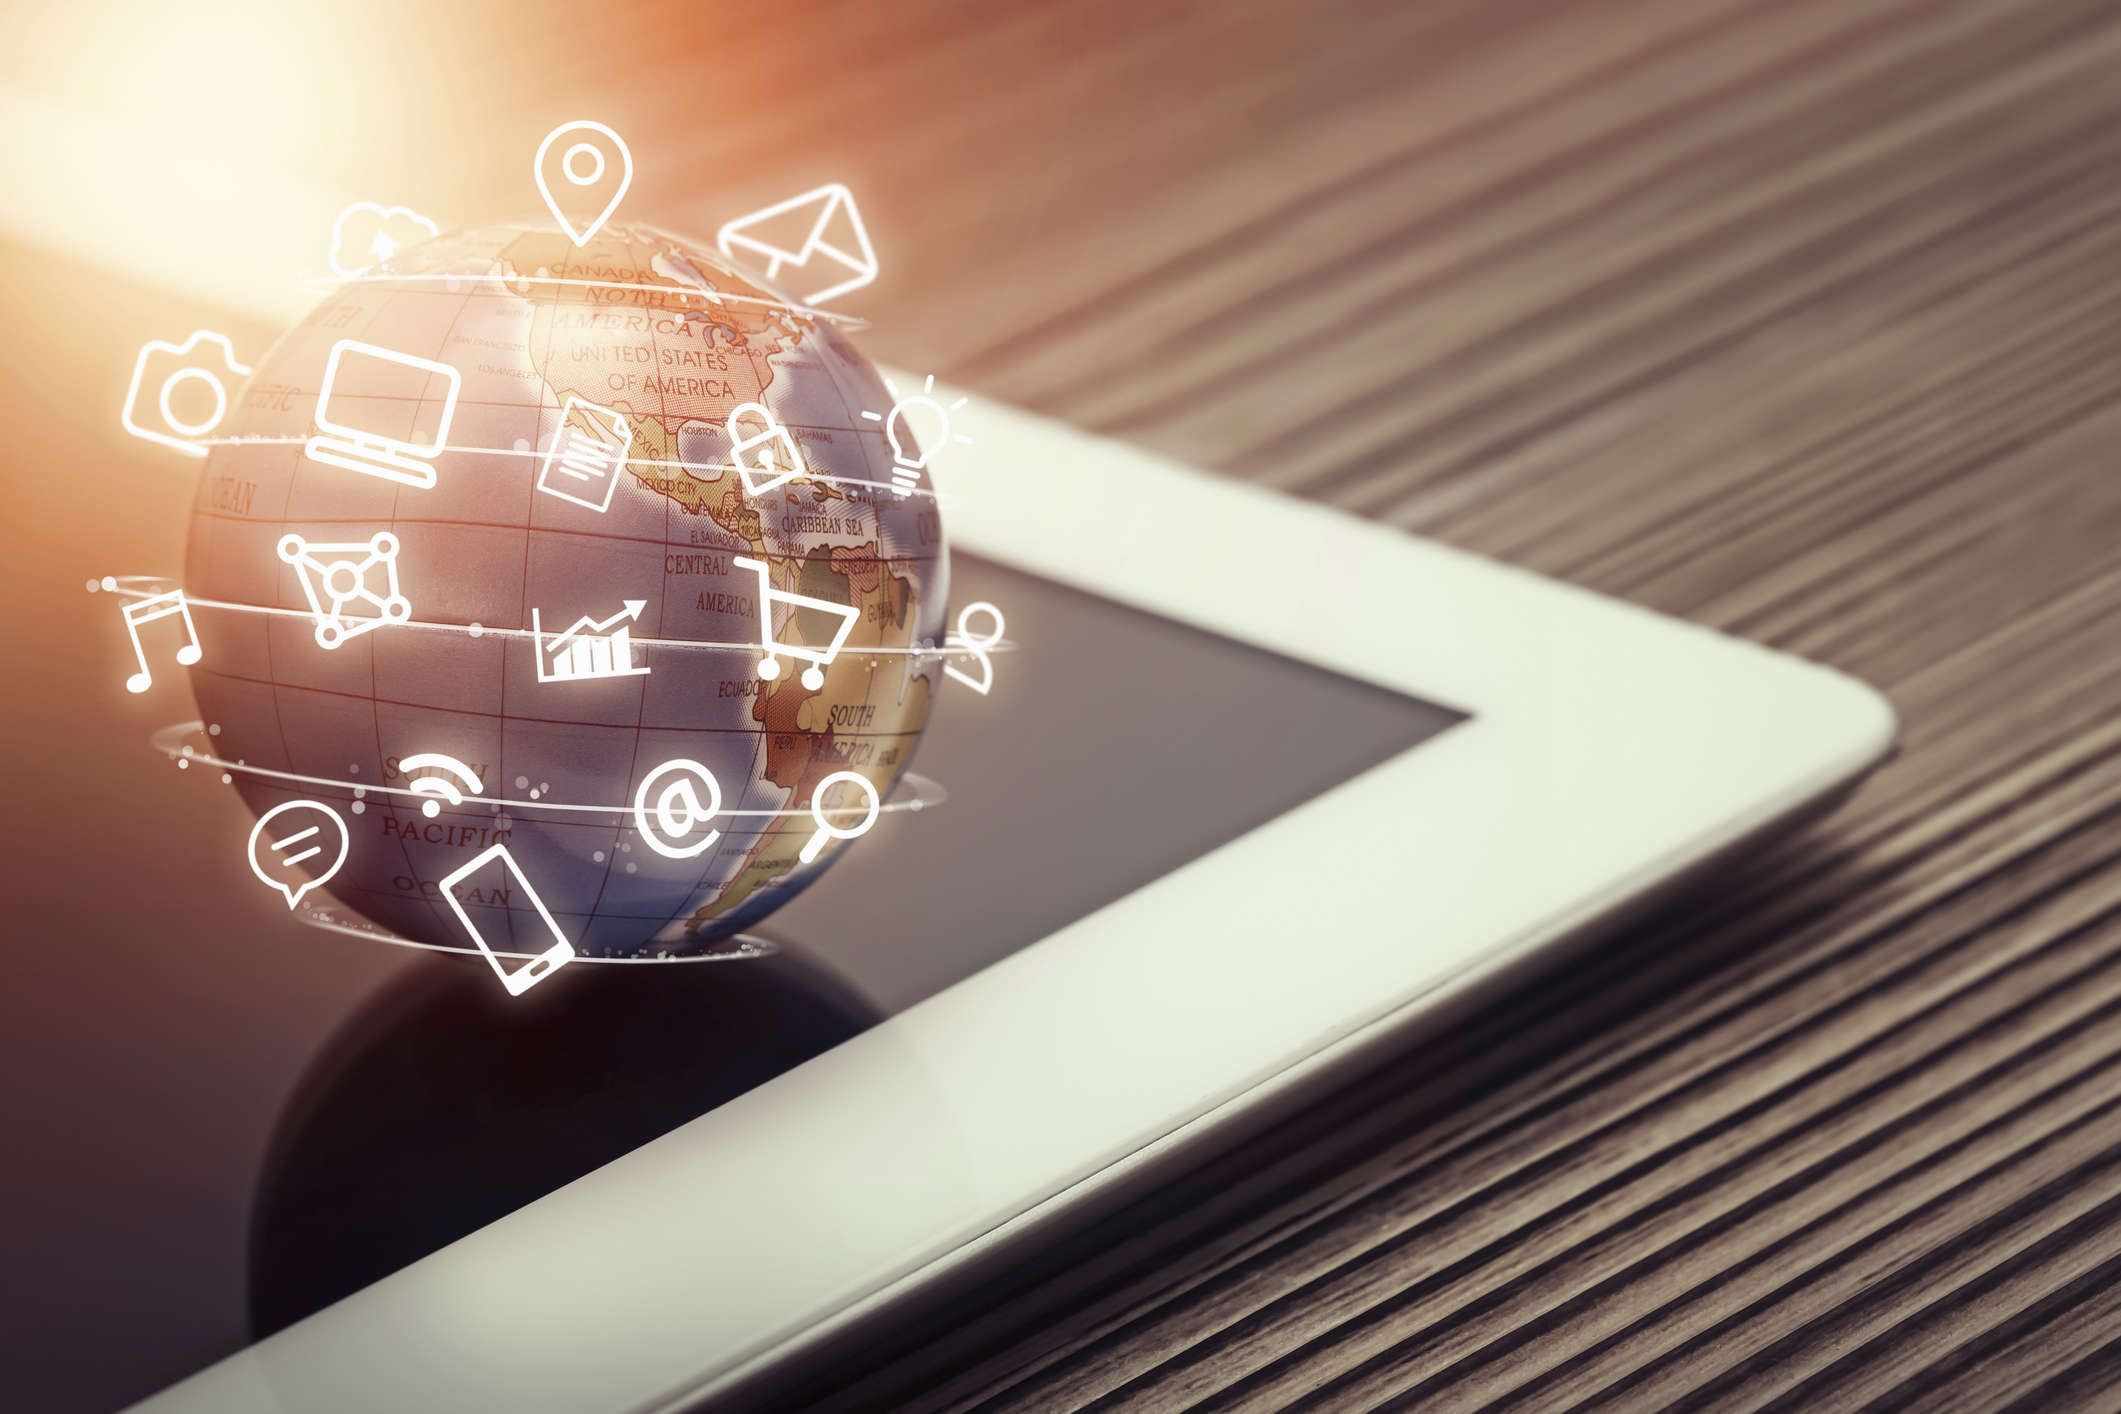 Gartner 25 Billion Connected Things Will Be In Use By 2021 Gartner